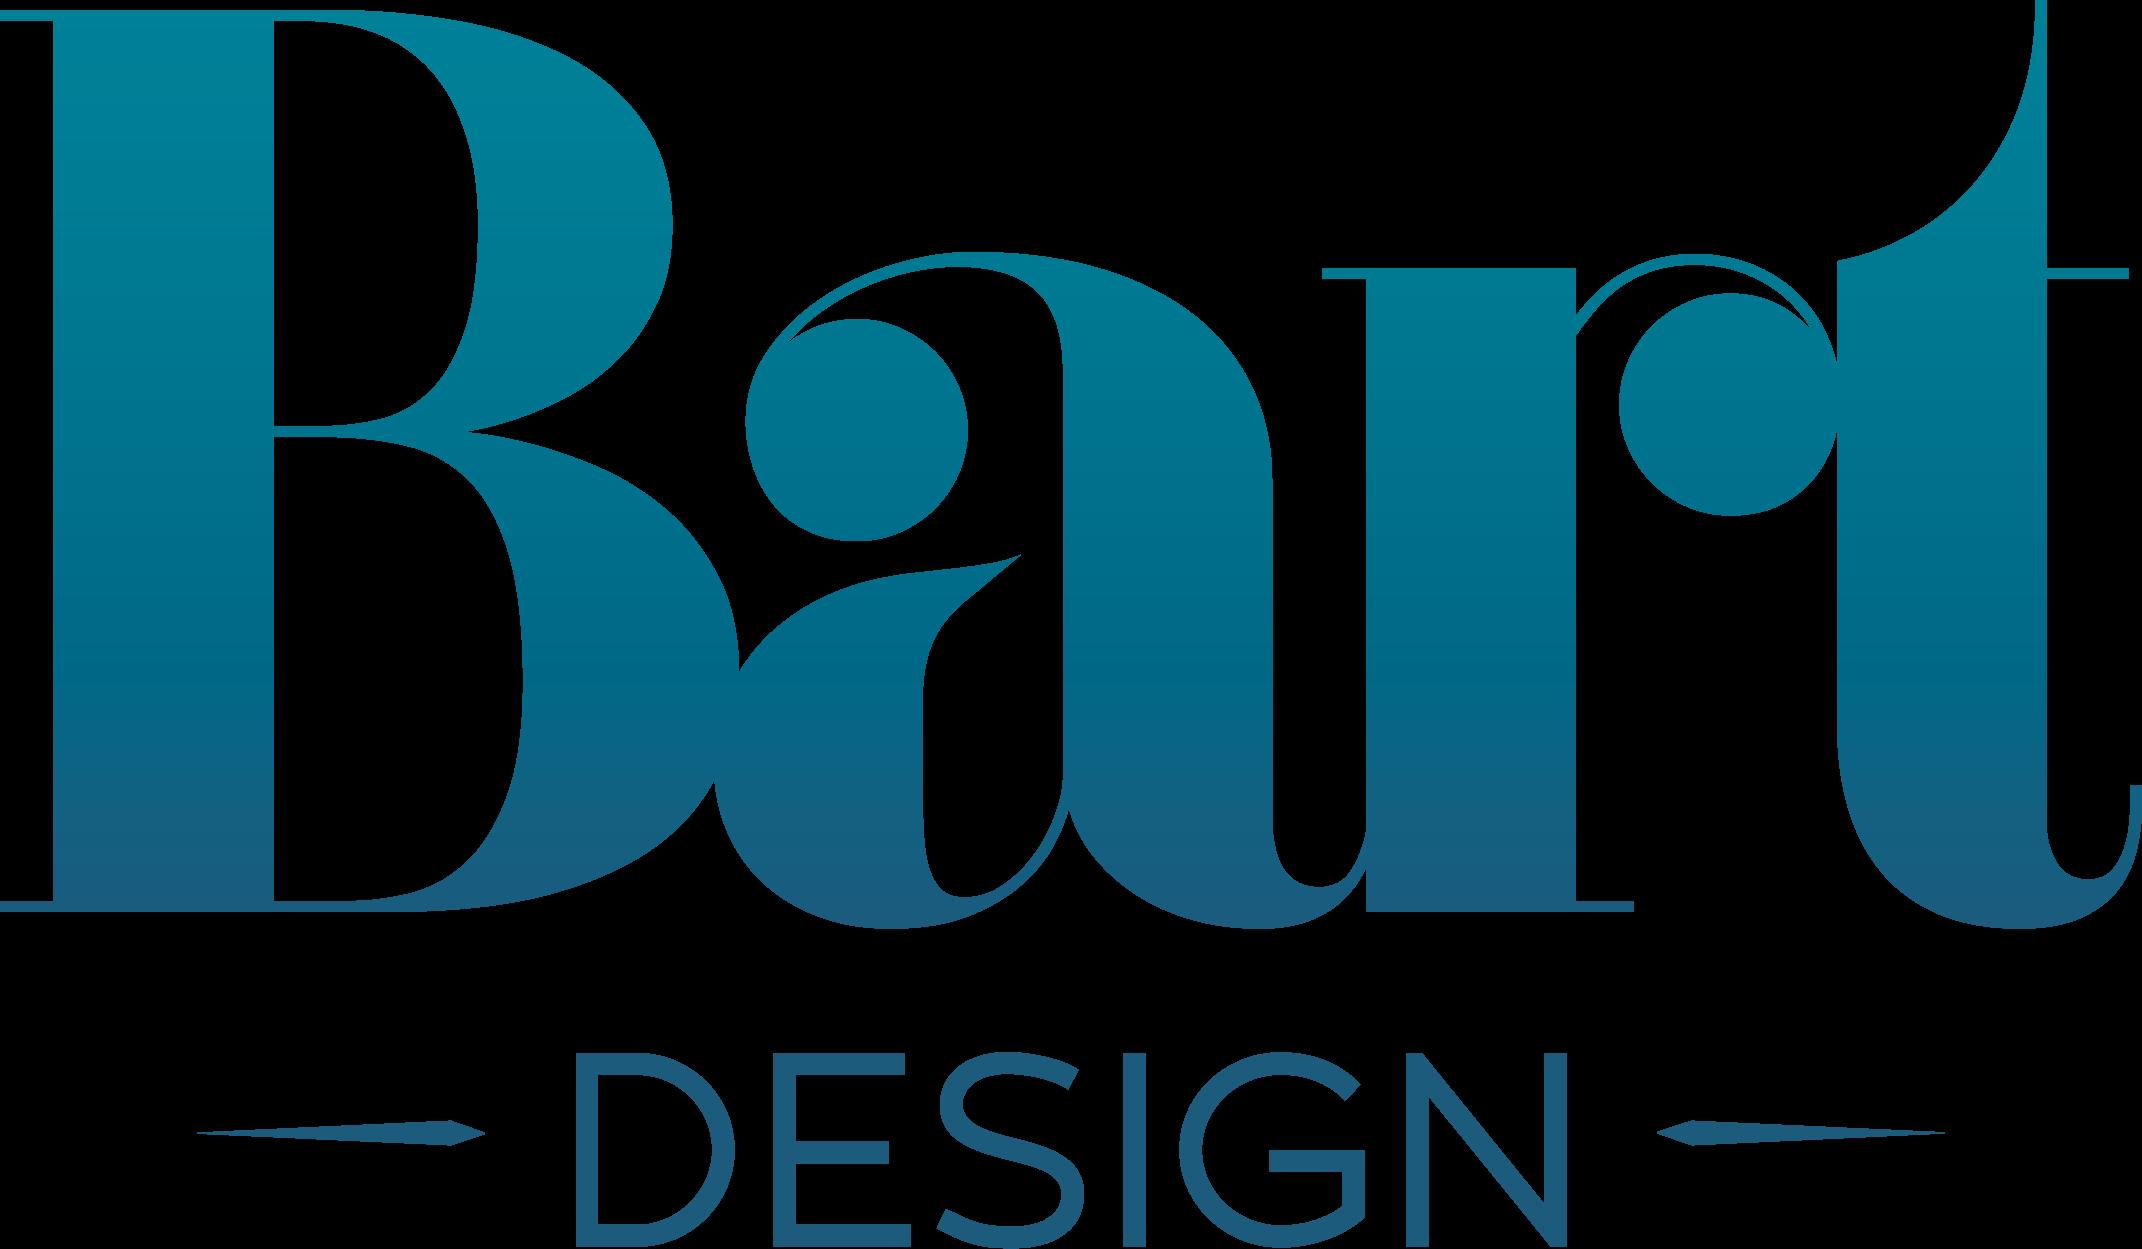 Bart Design